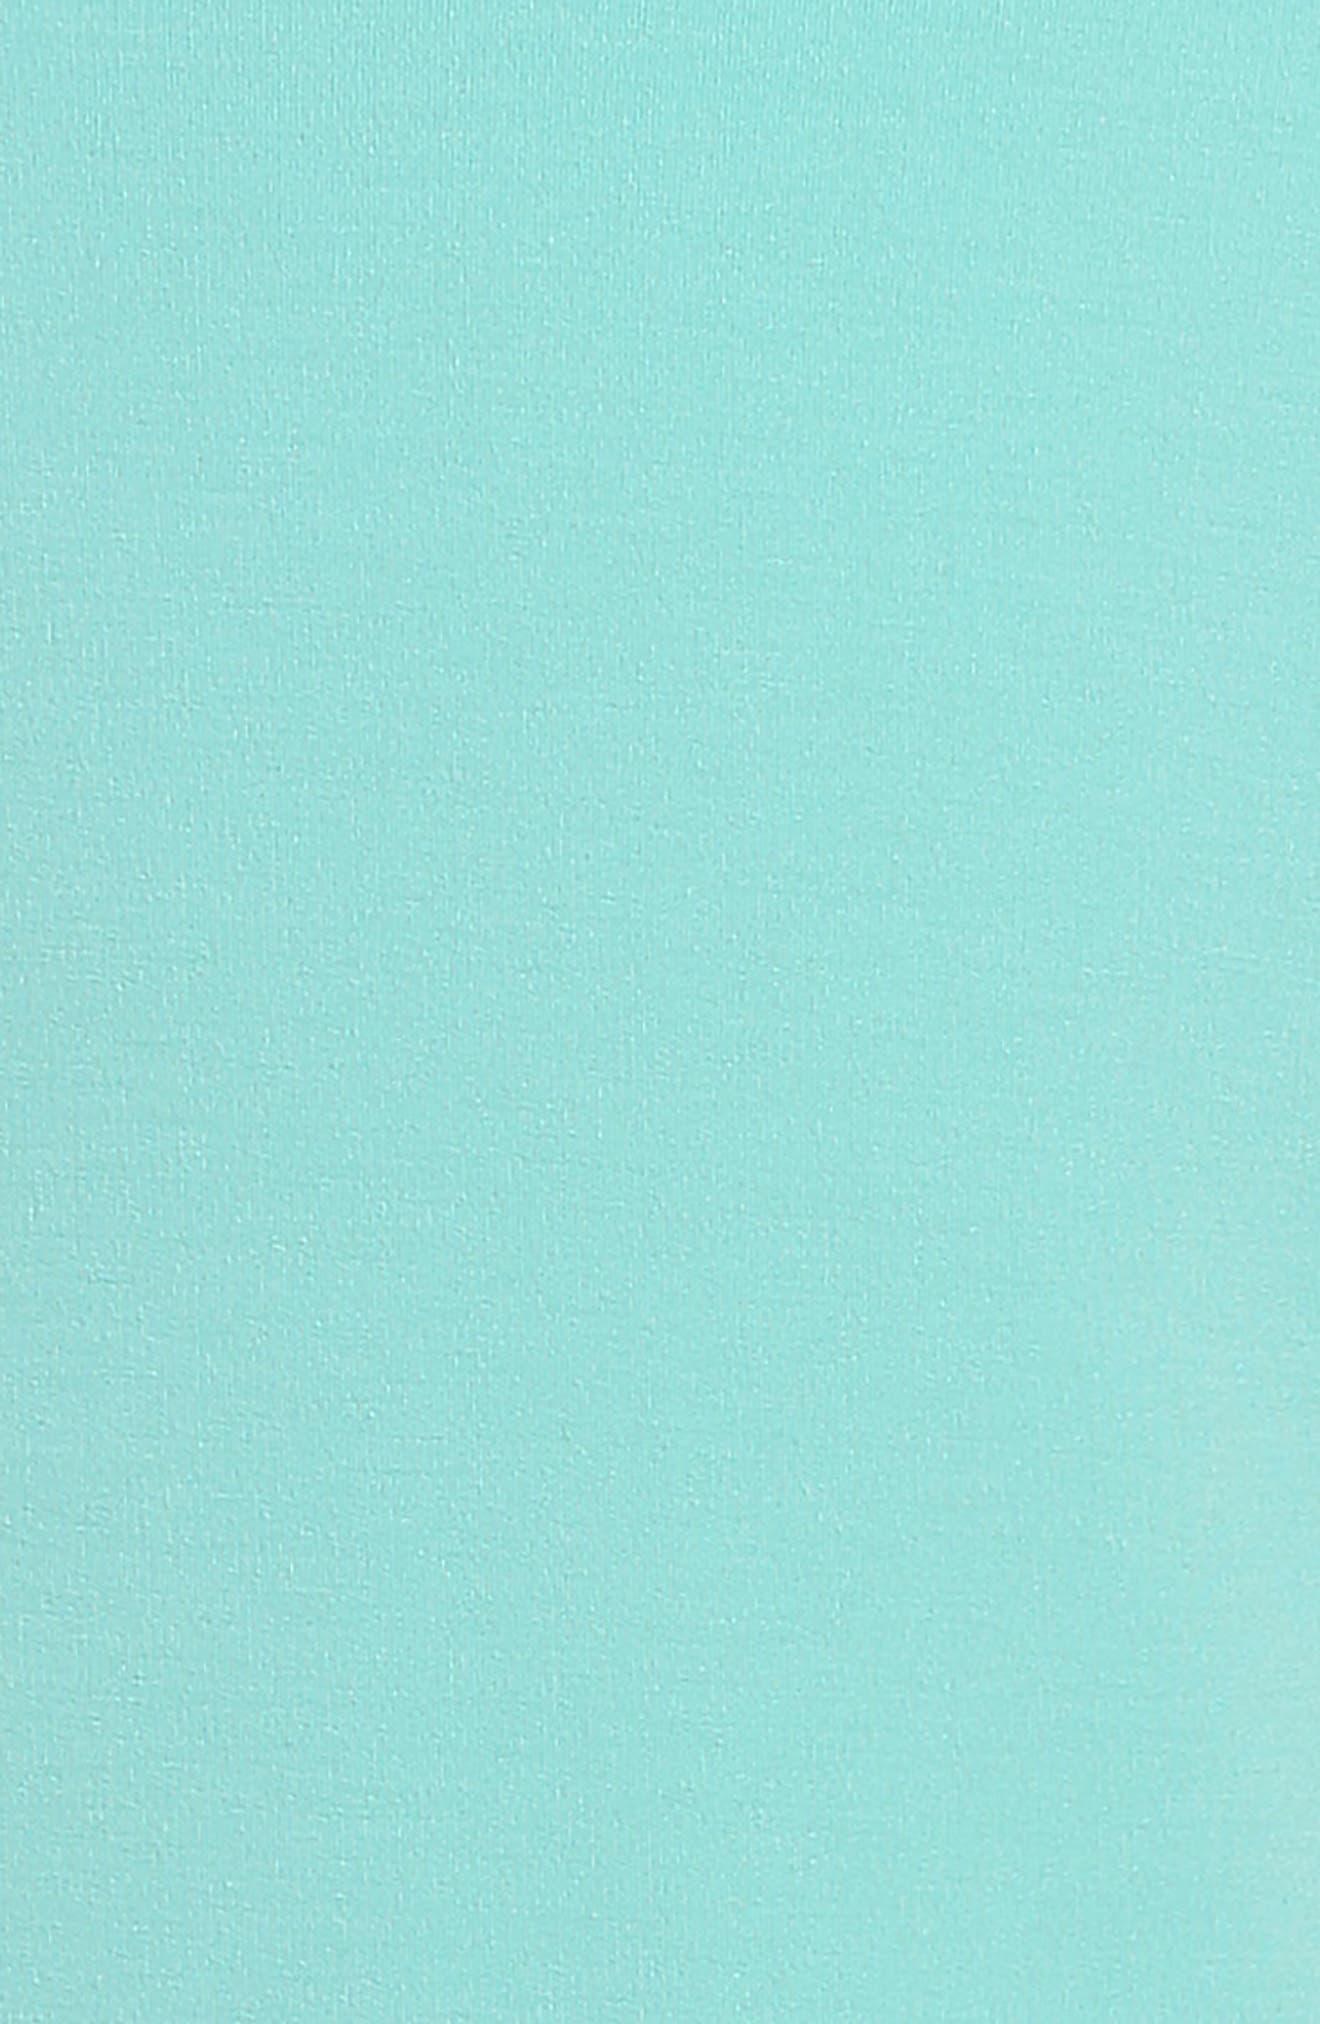 Ruffle Sleeve Dress,                             Alternate thumbnail 3, color,                             310